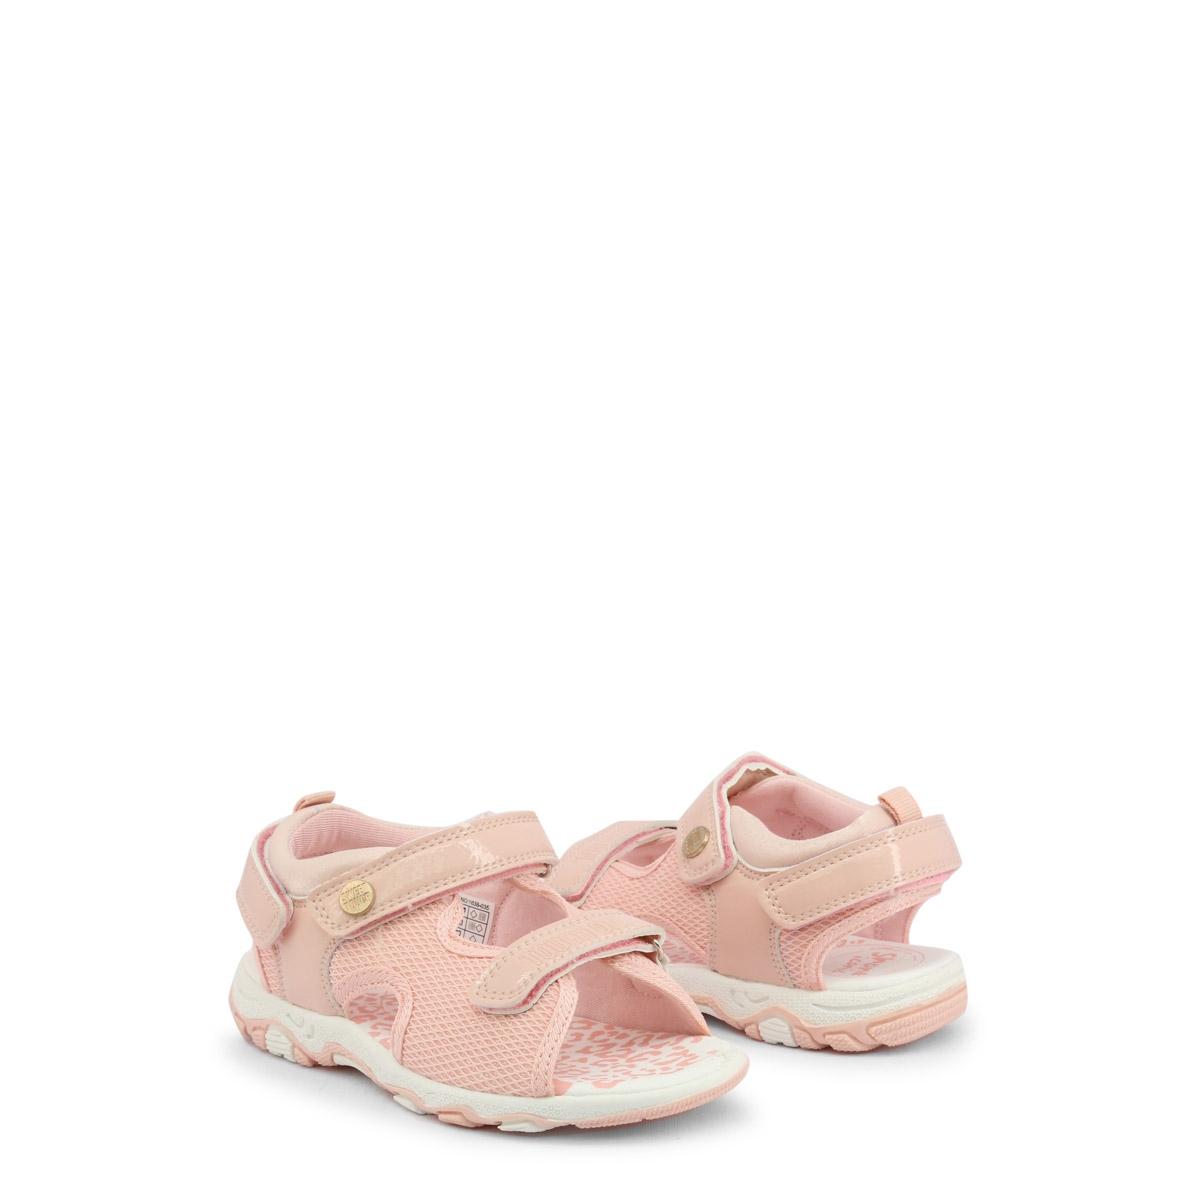 Sandale Shone 1638-035 Roz